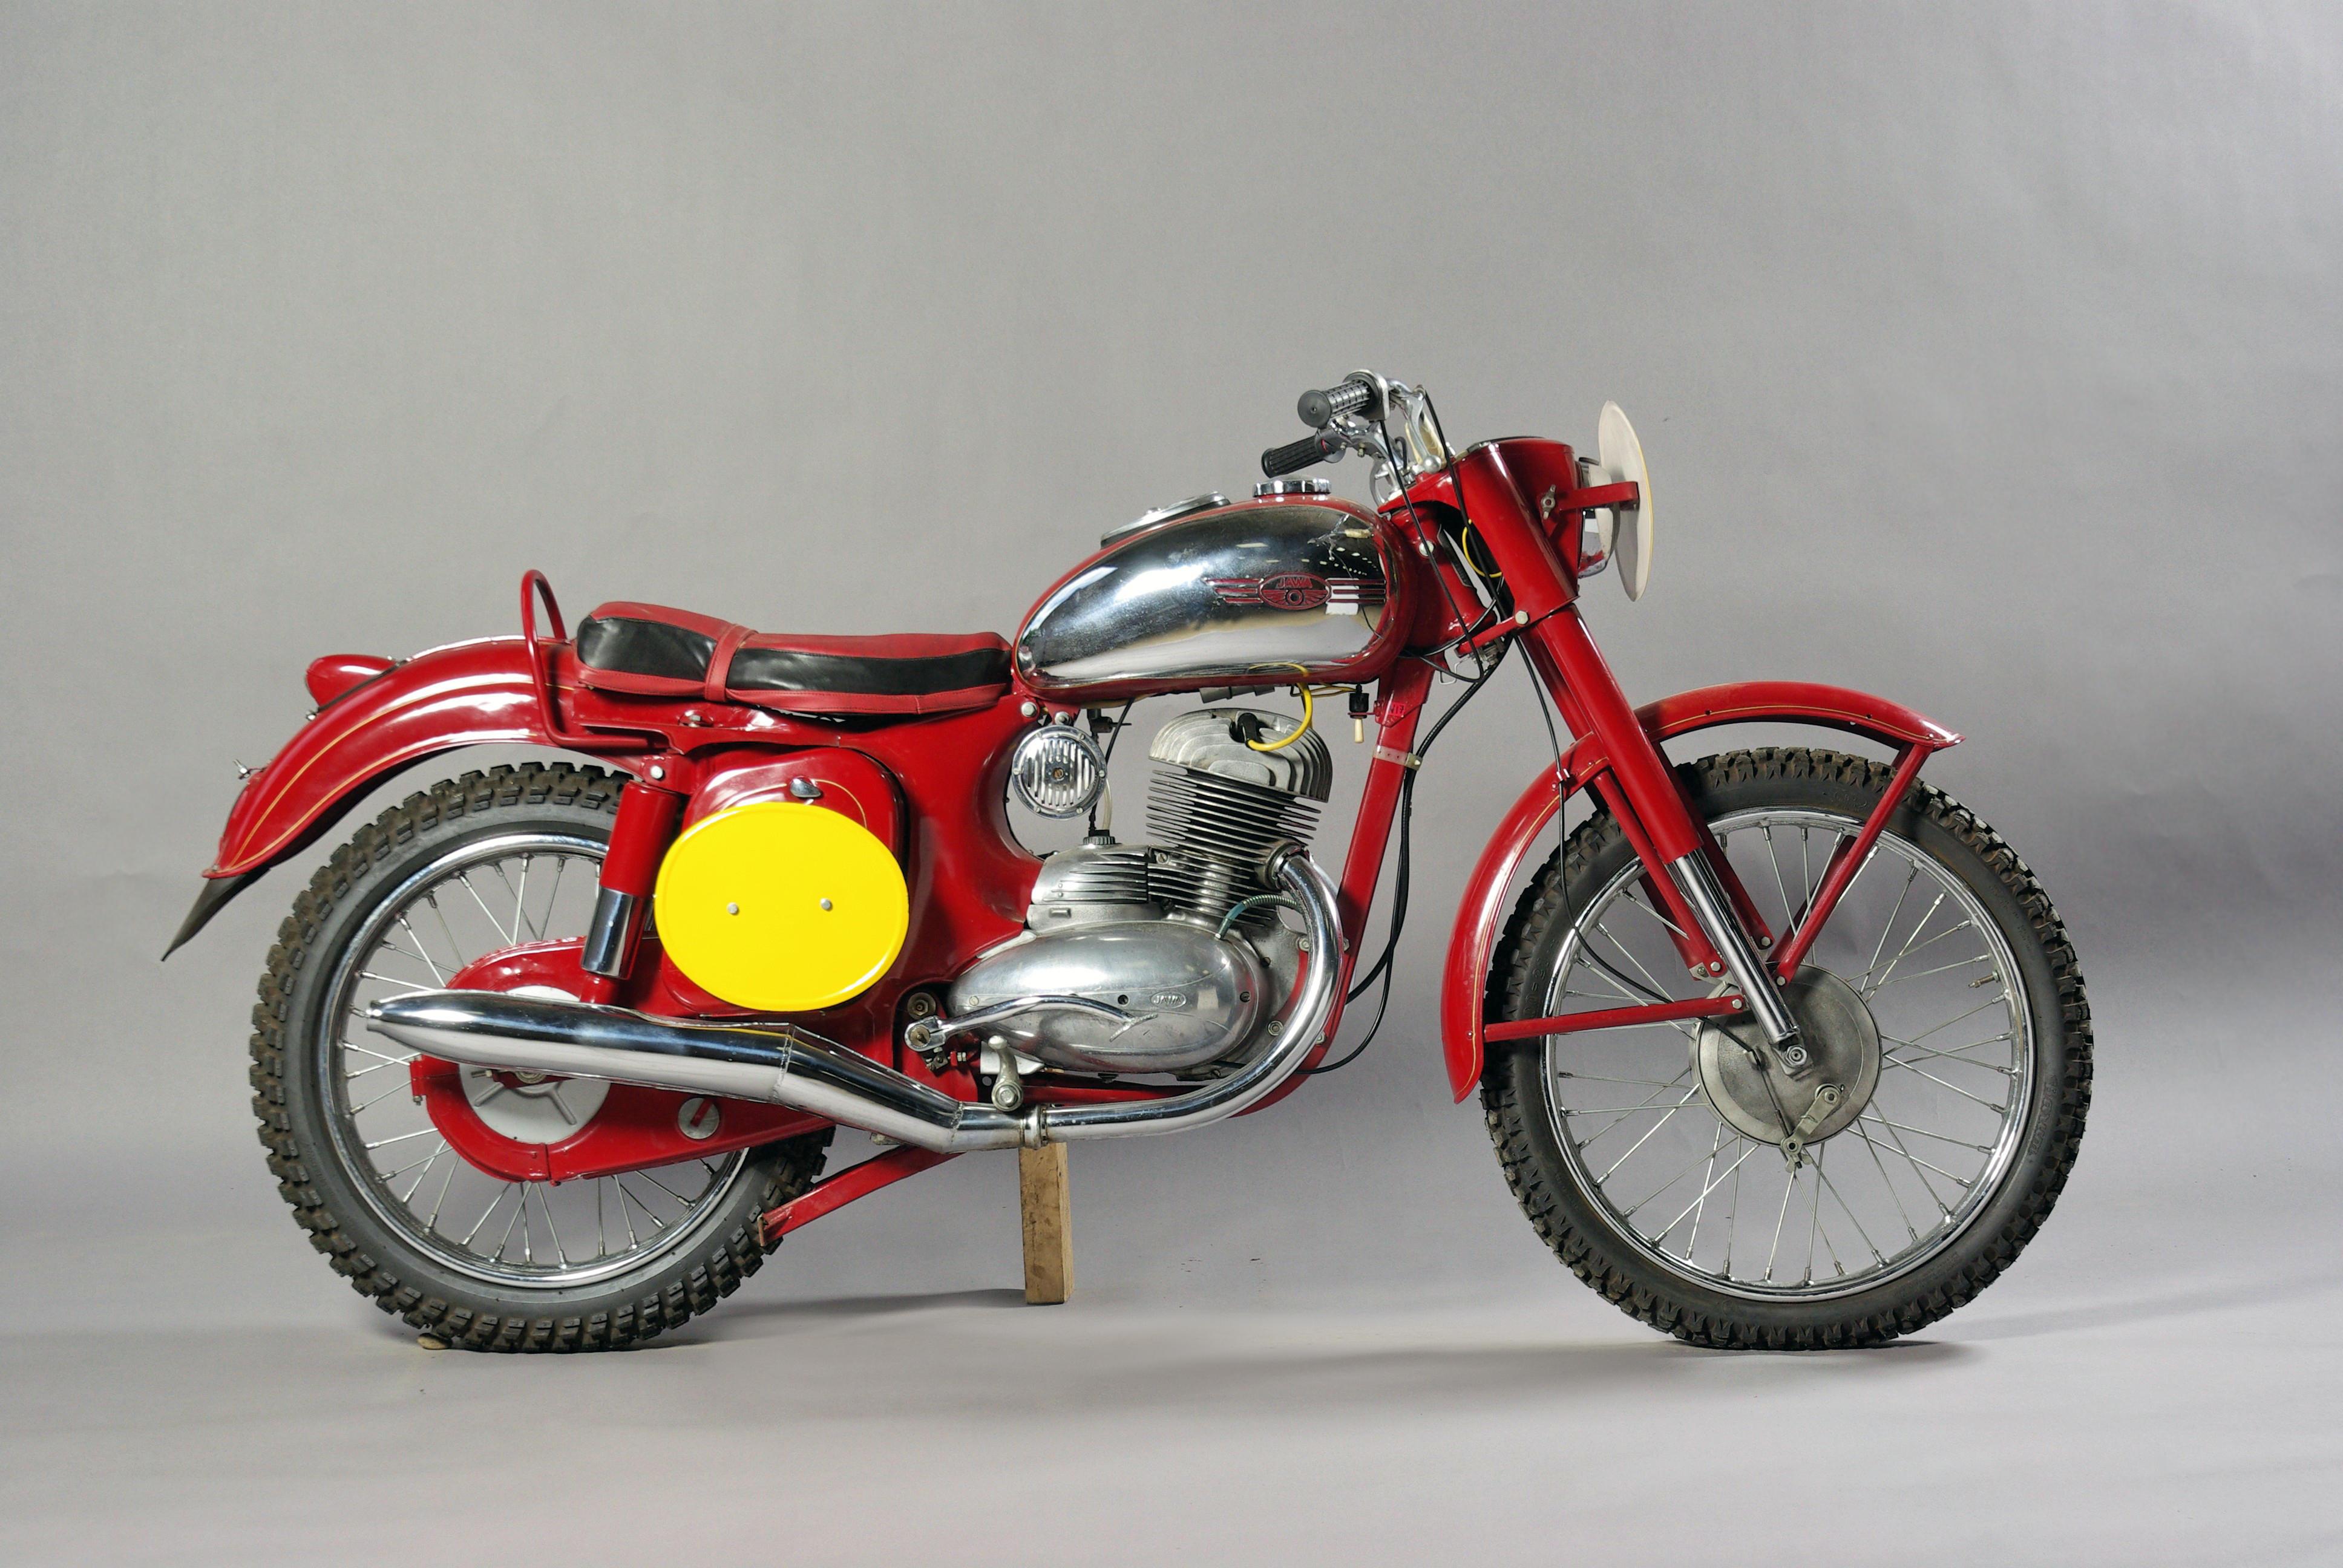 Cz Motorcycles Engine Diagram - Machine Repair Manual on